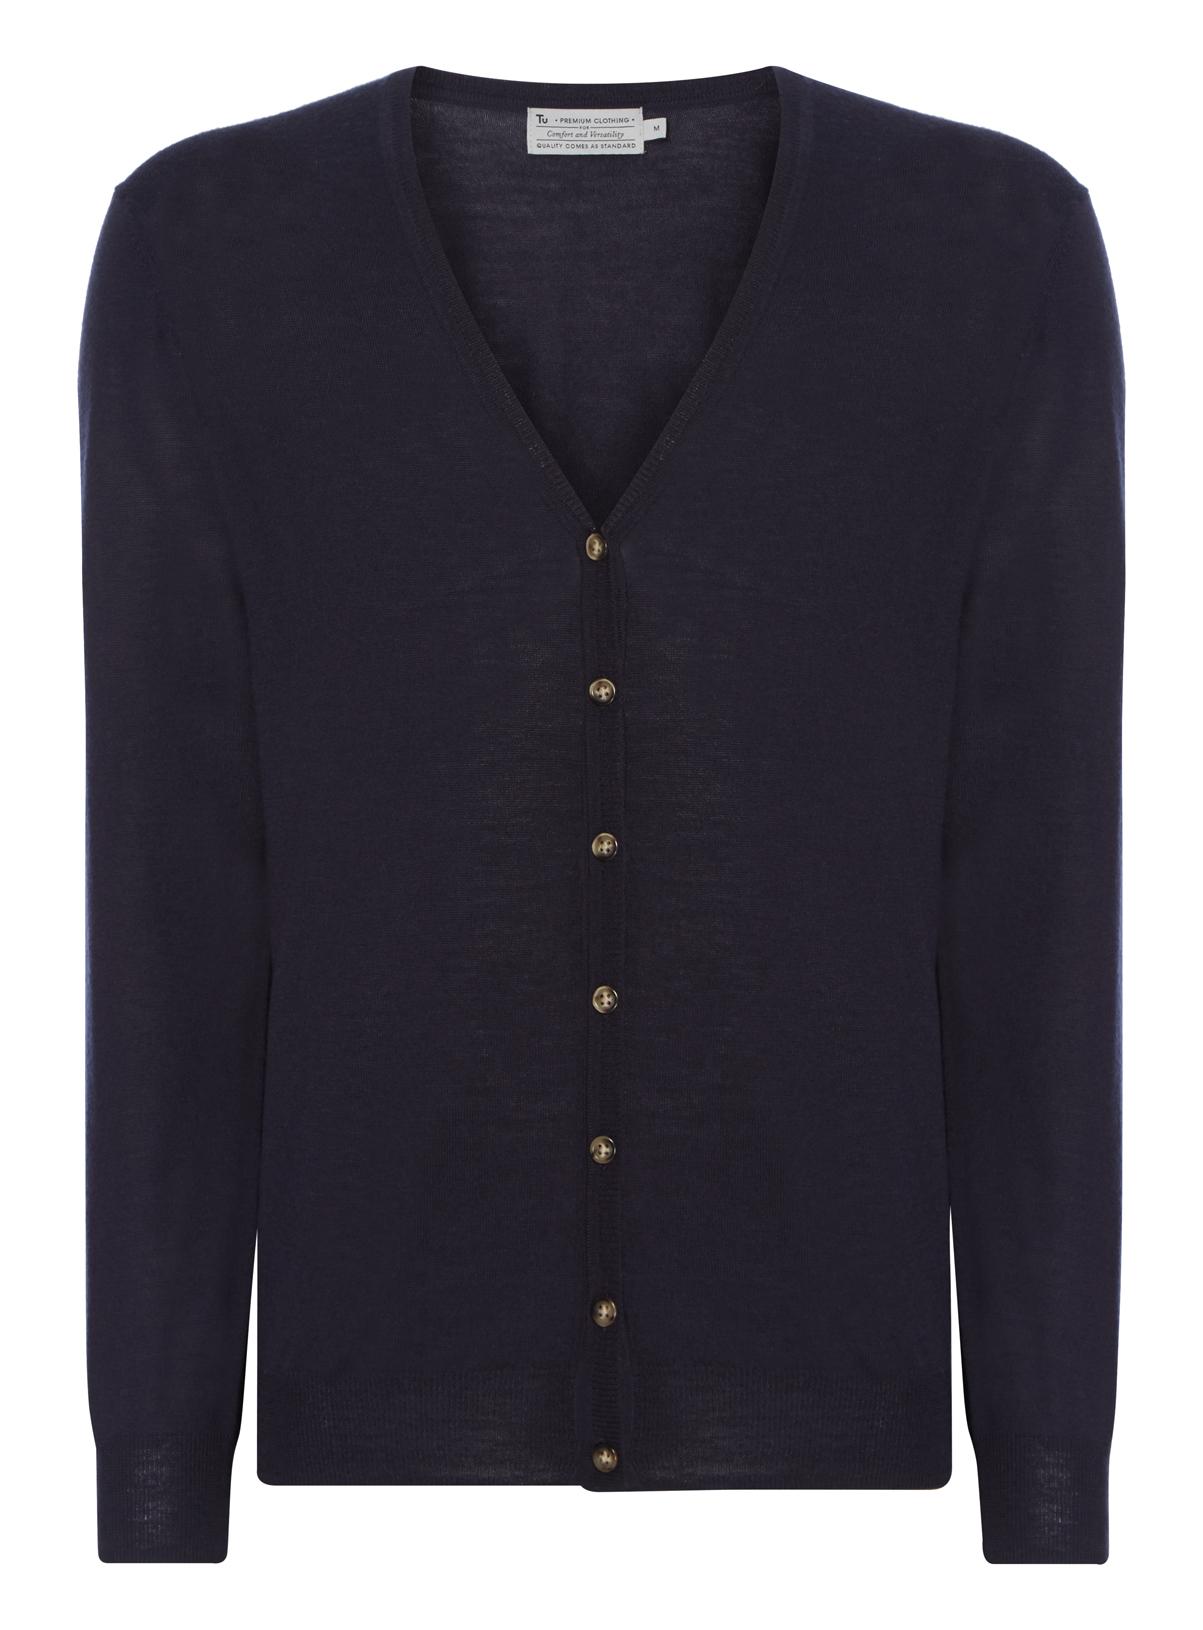 Mens Navy Merino Wool Cardigan | Tu clothing